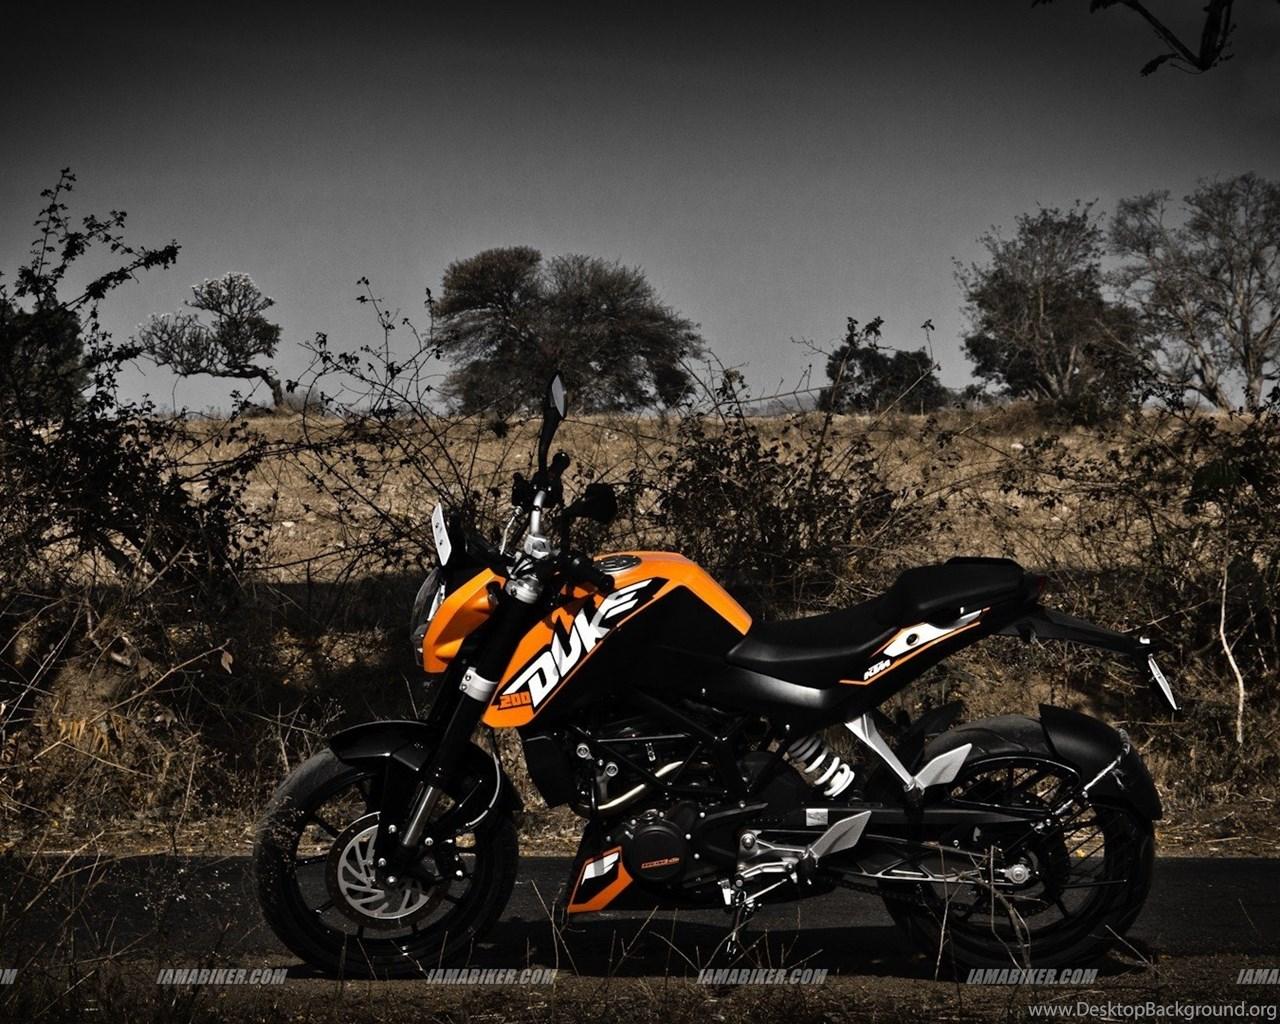 ktm duke bike click for high resolution hd pics hq backgrounds desktop background ktm duke bike click for high resolution